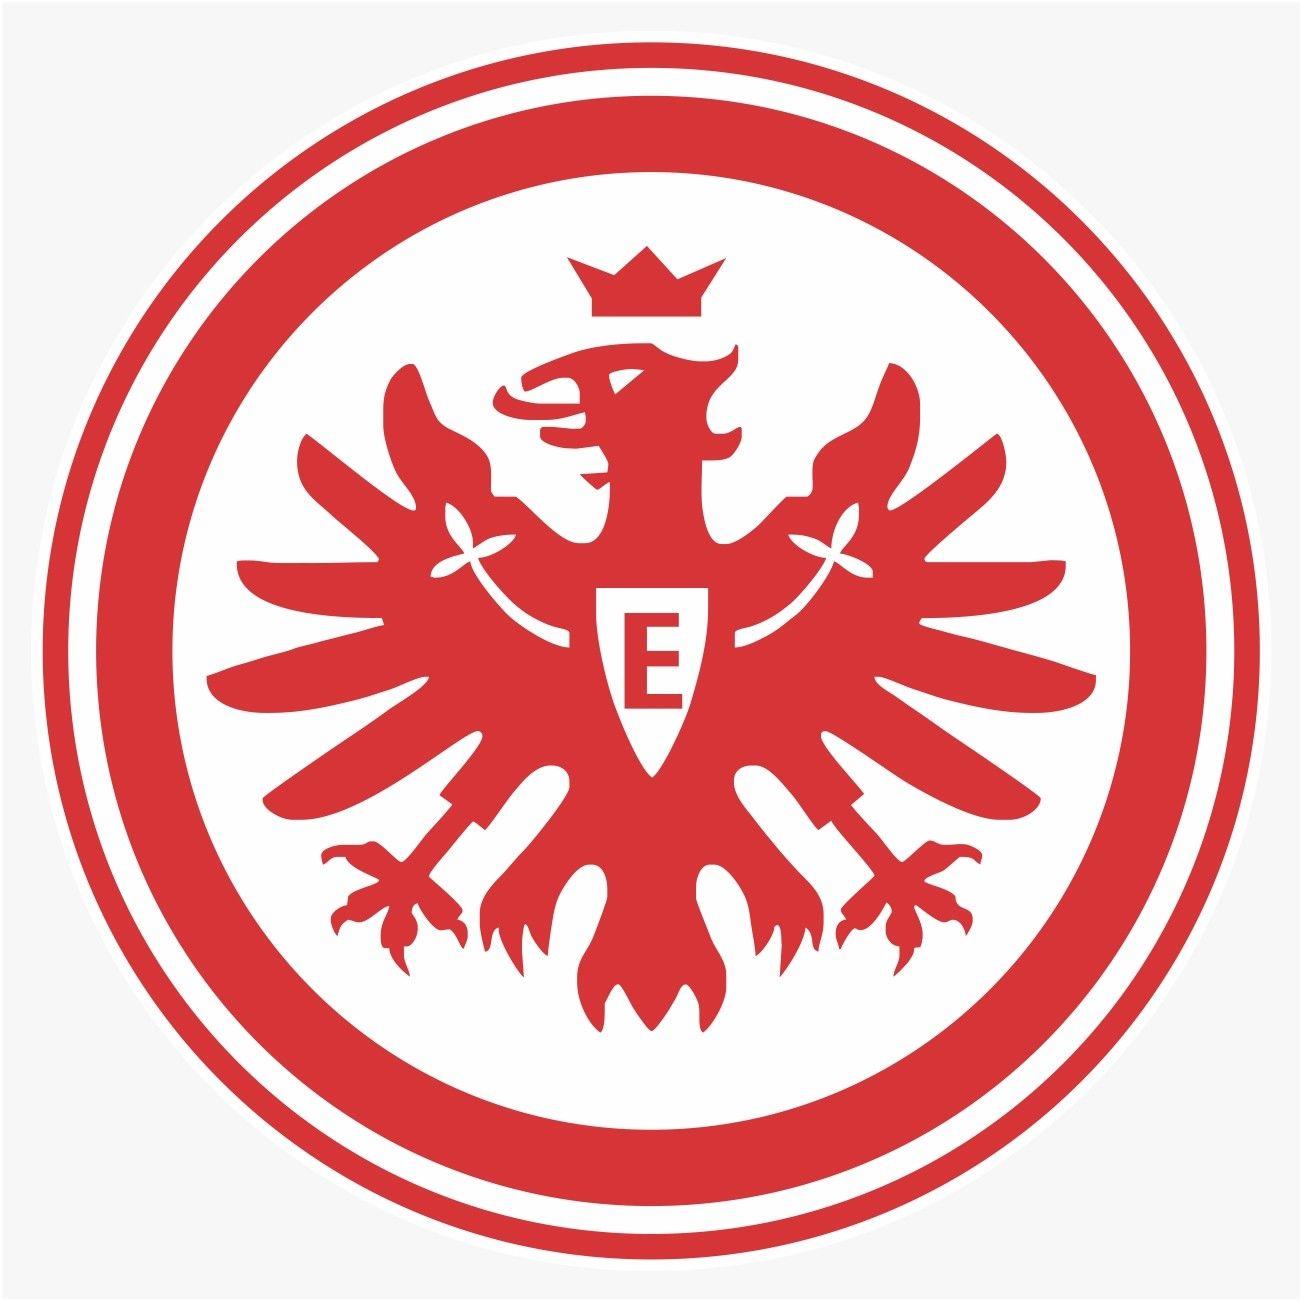 3 95 Eintracht Frankfurt Uefa Diecut Vinyl Decal Sticker Buy 1 Get 2 Free Ebay Collectibles Bundesliga Logo Frankfurt Germany Football